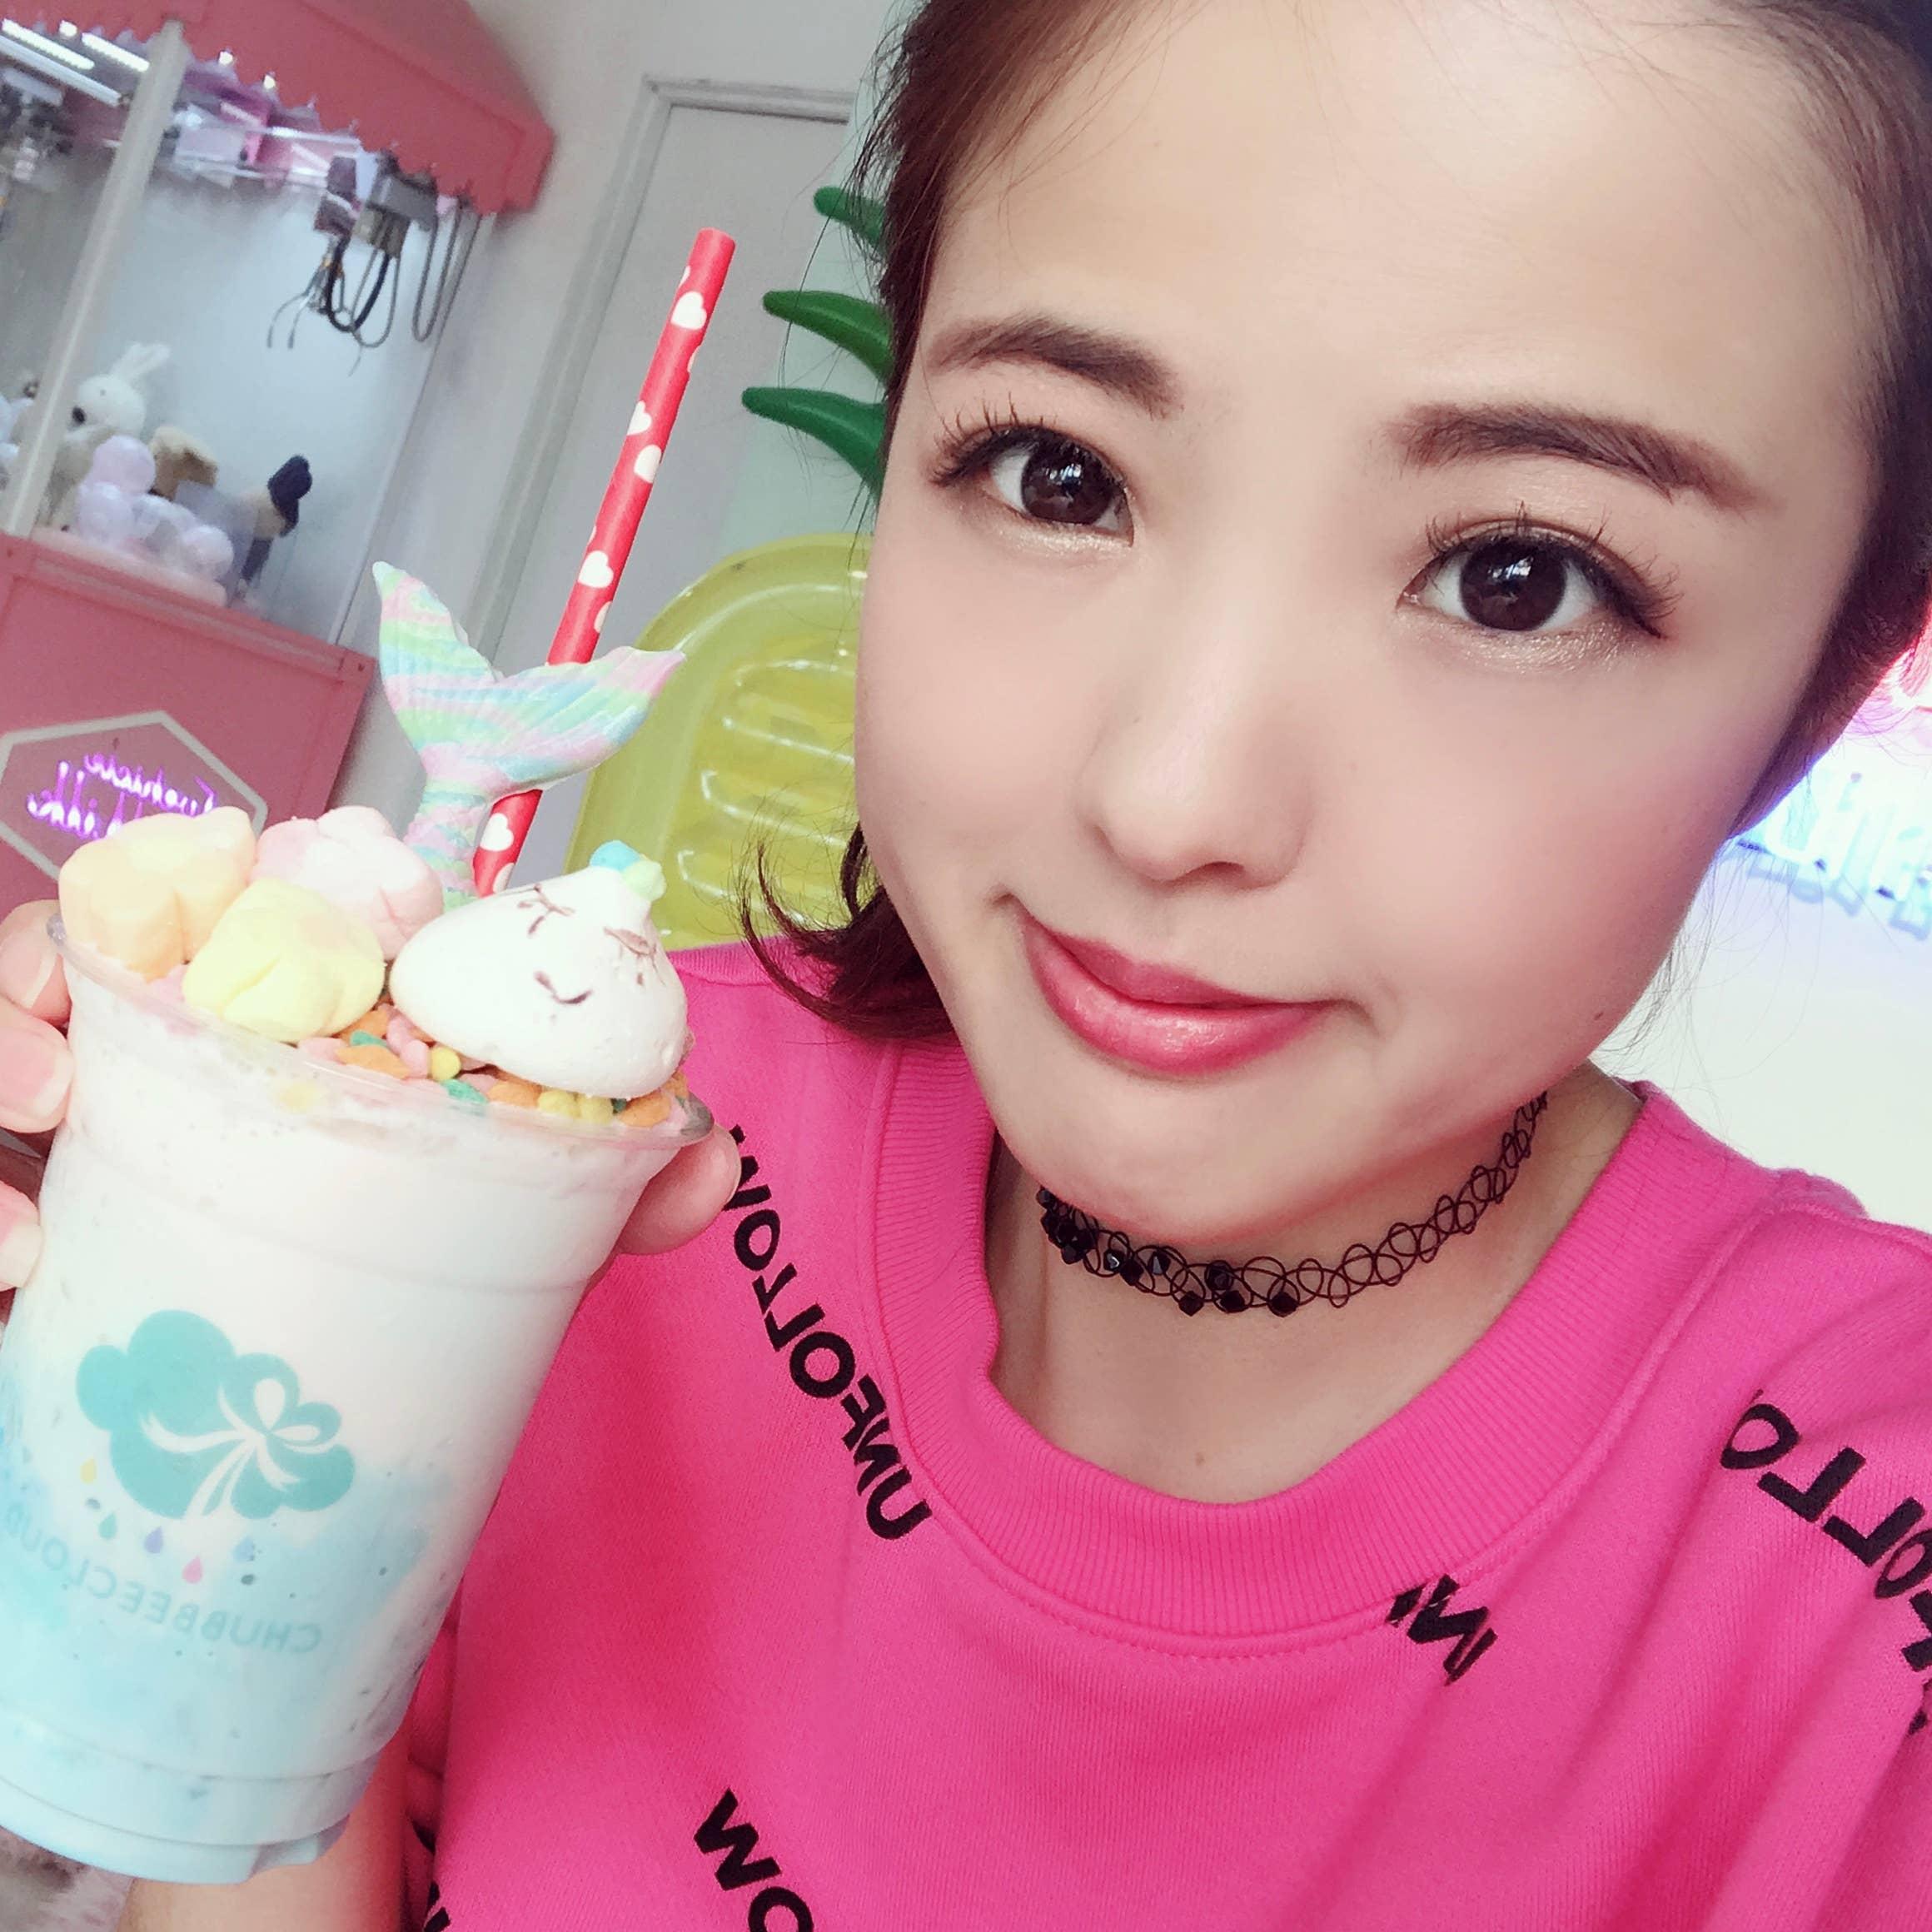 Yumi Shiozaki